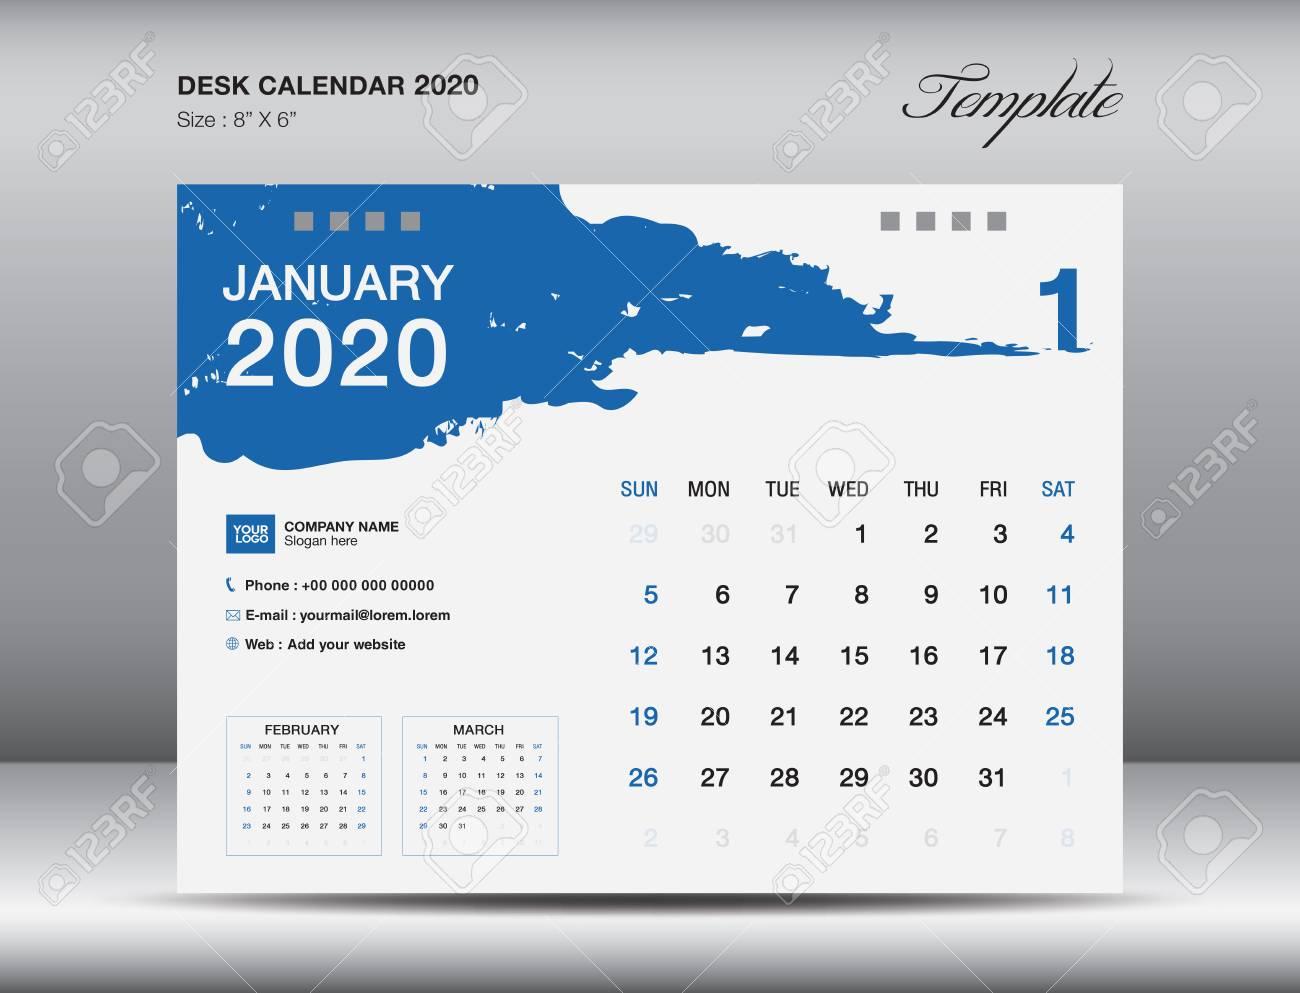 Desk Calendar 2020 Template Vector, January 2020 Month, Business..